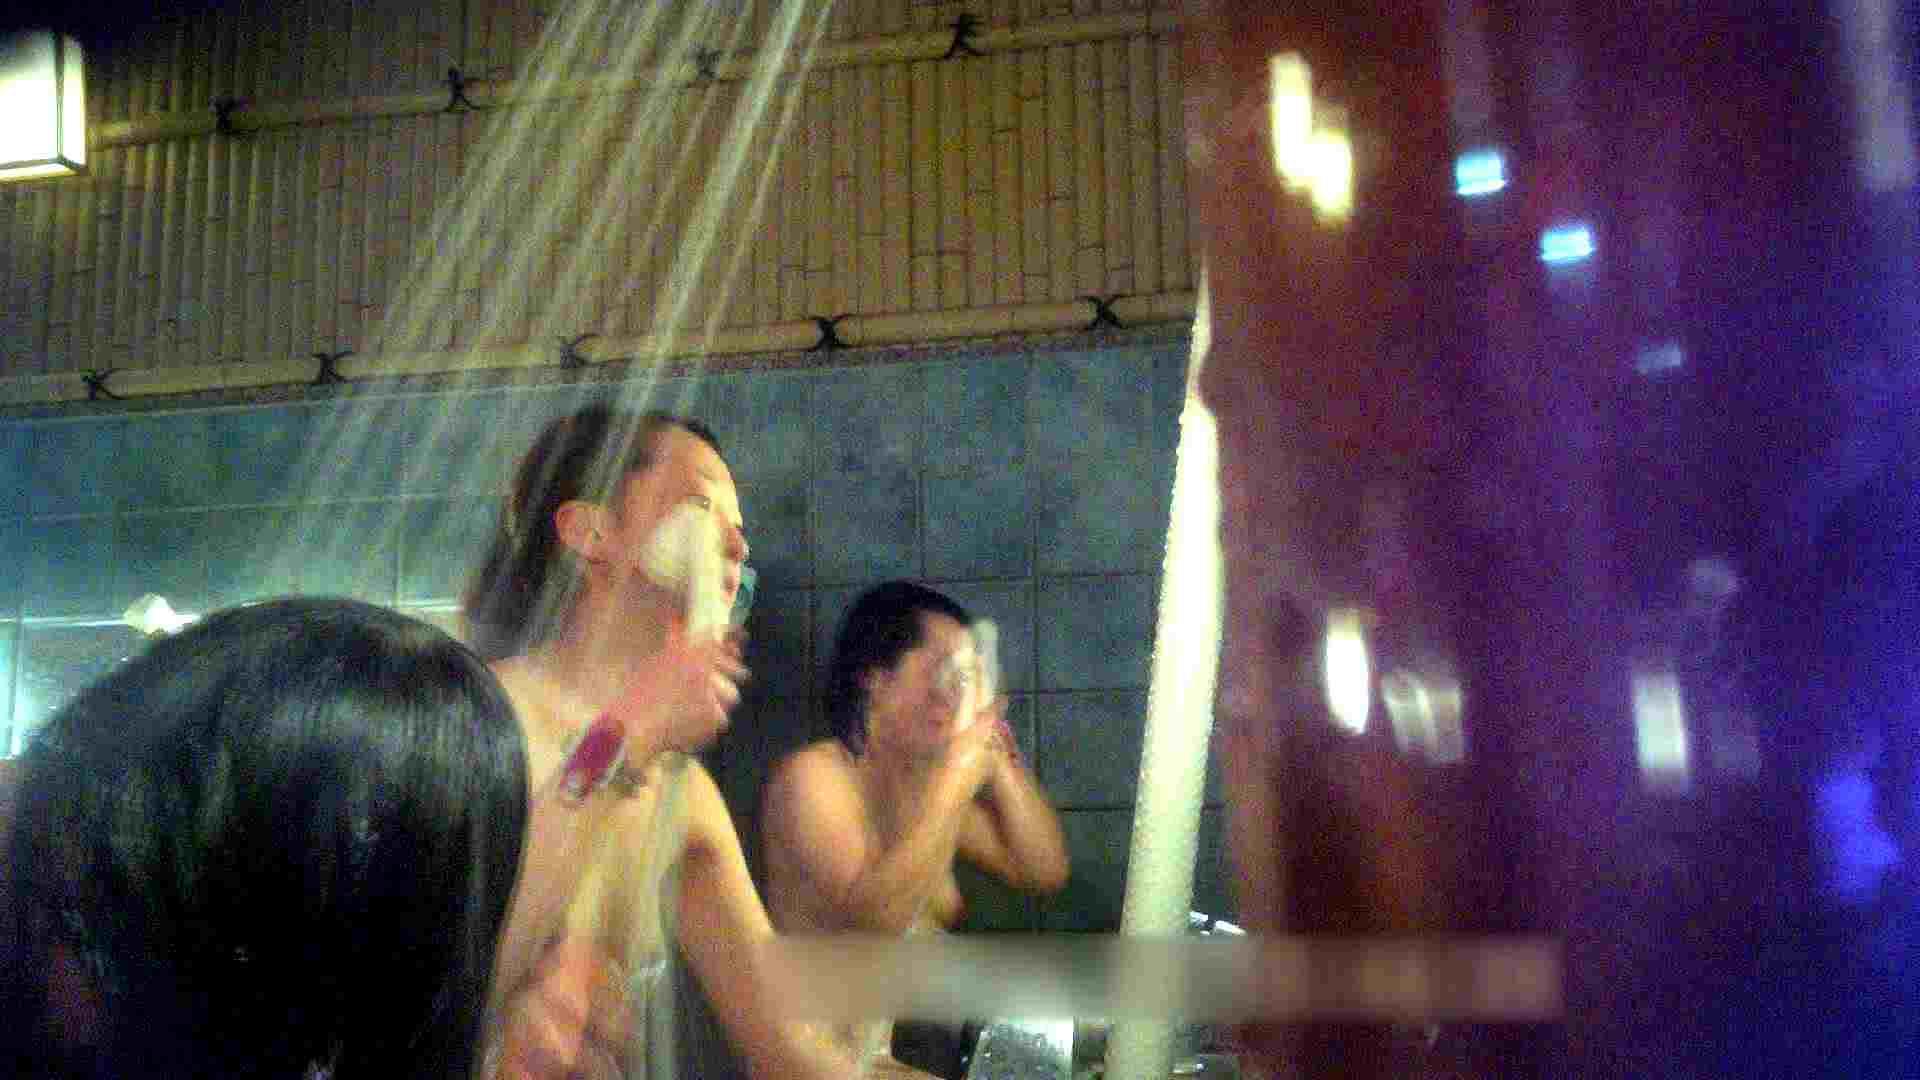 TG.12 【上等兵】いやぁ若い!ぷっちぷちギャル!でも時間短い・・・ 貧乳フェチへ オマンコ動画キャプチャ 106枚 52